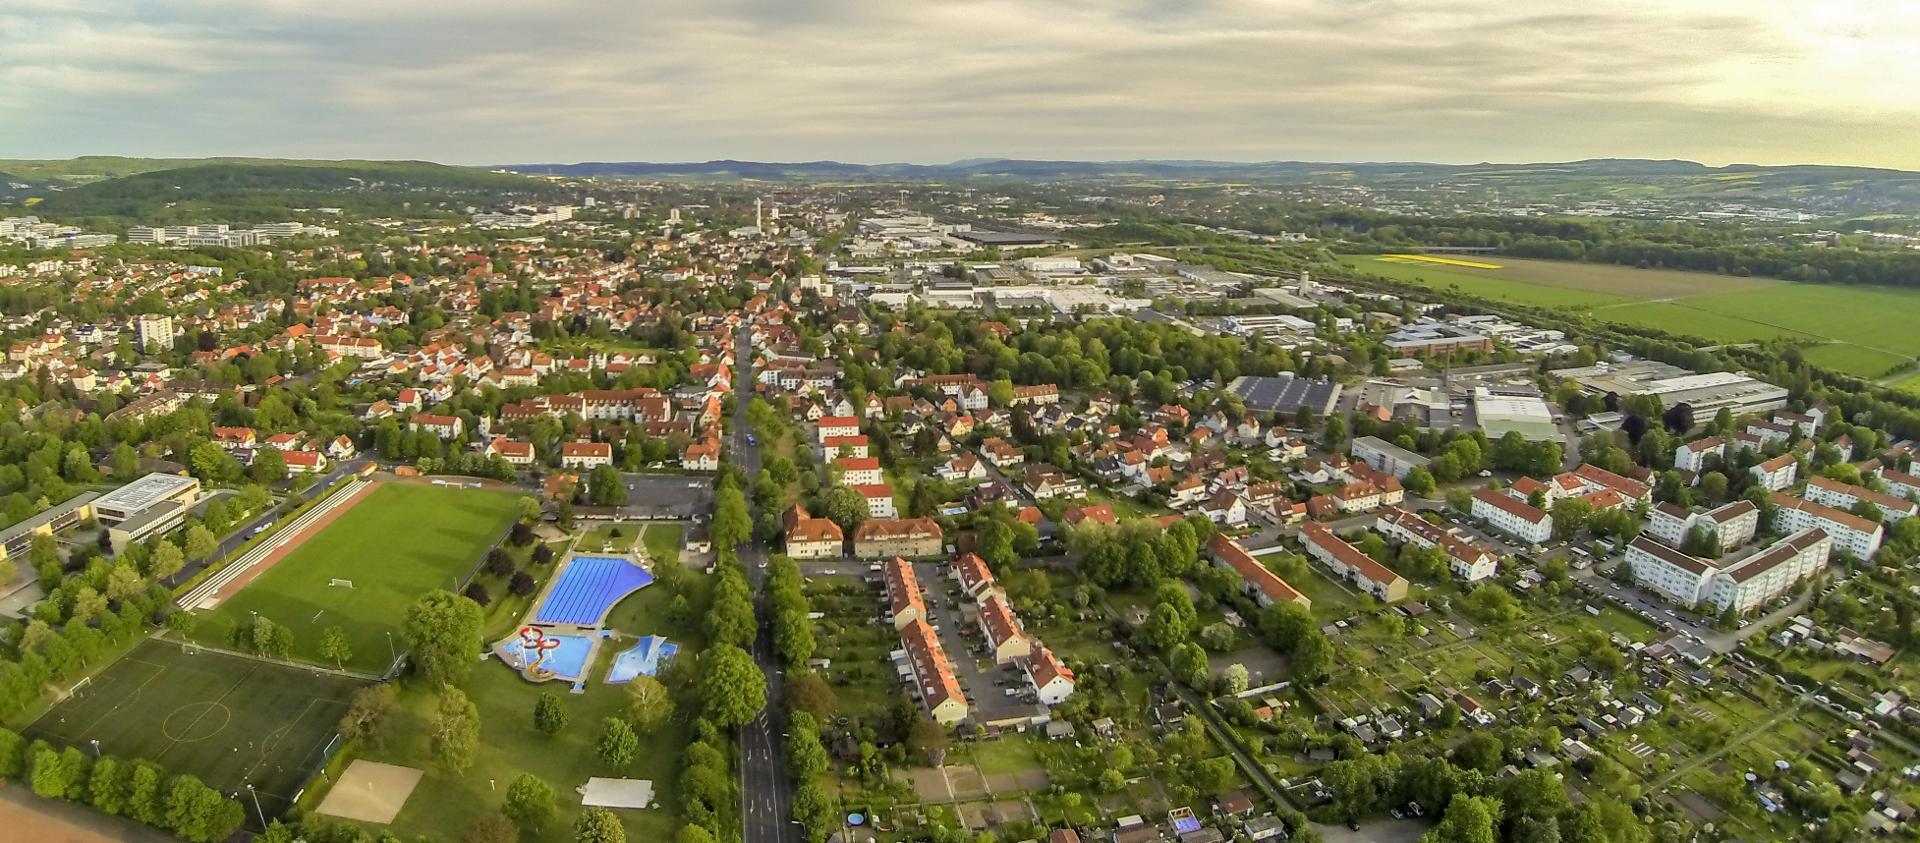 Immobilien Göttingen feinraum immobilien immobilienmakler in göttingen northeim einbeck